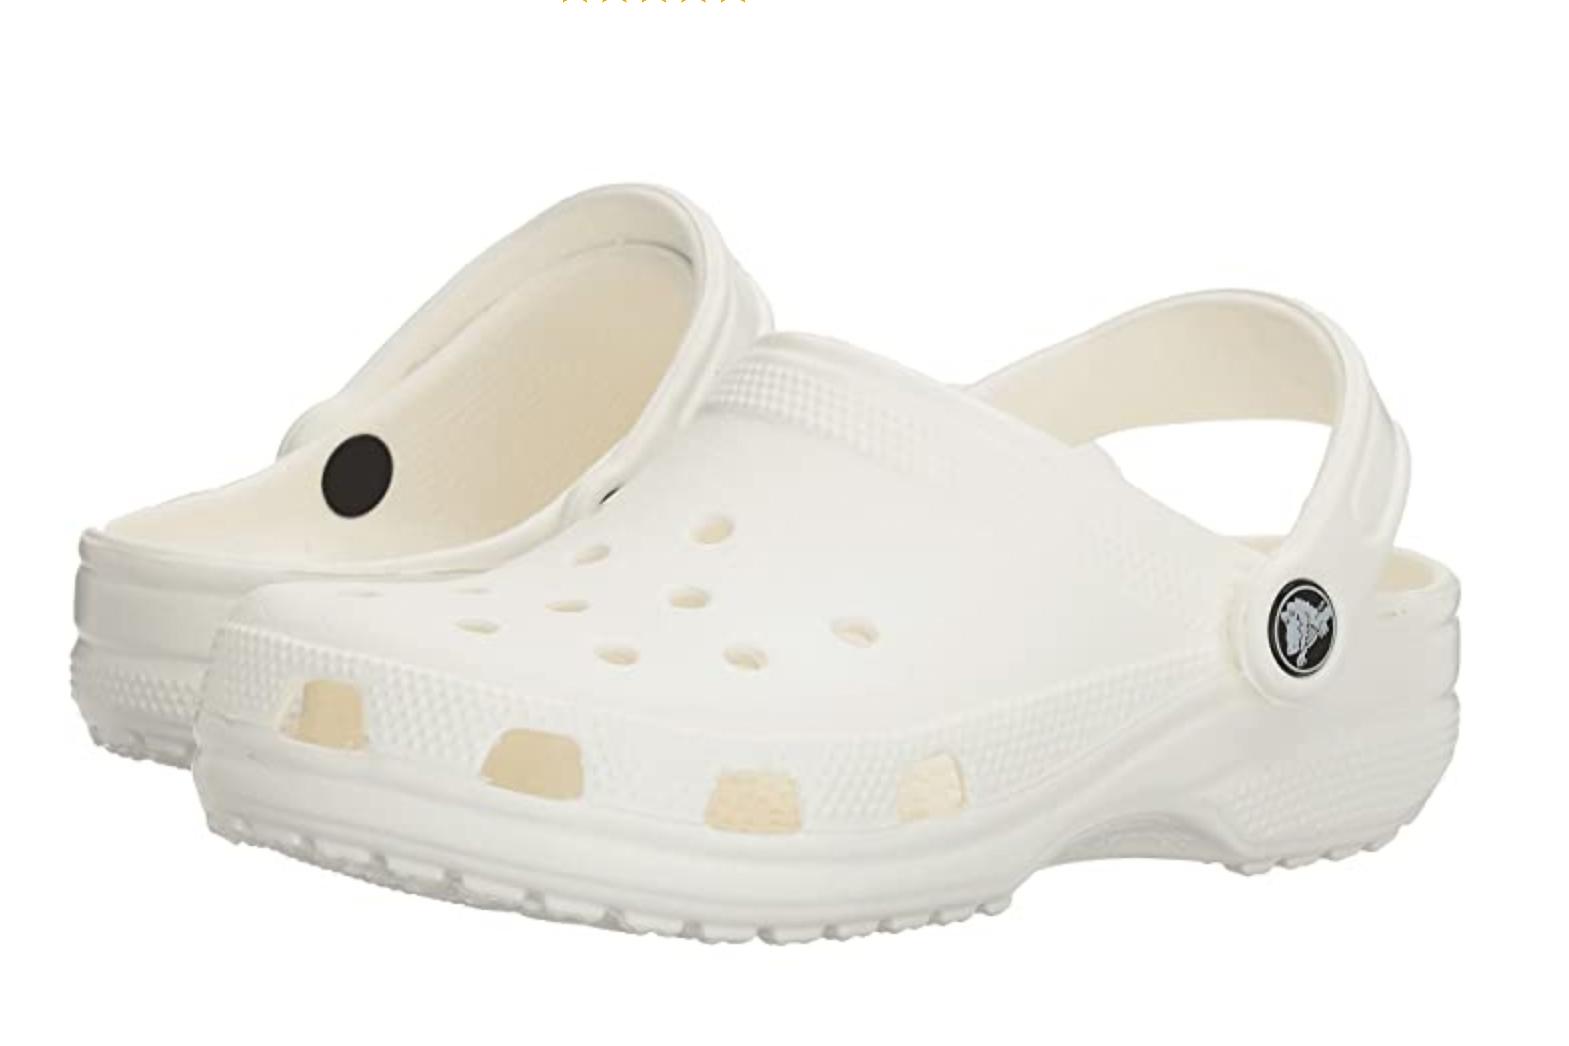 crocs are cool